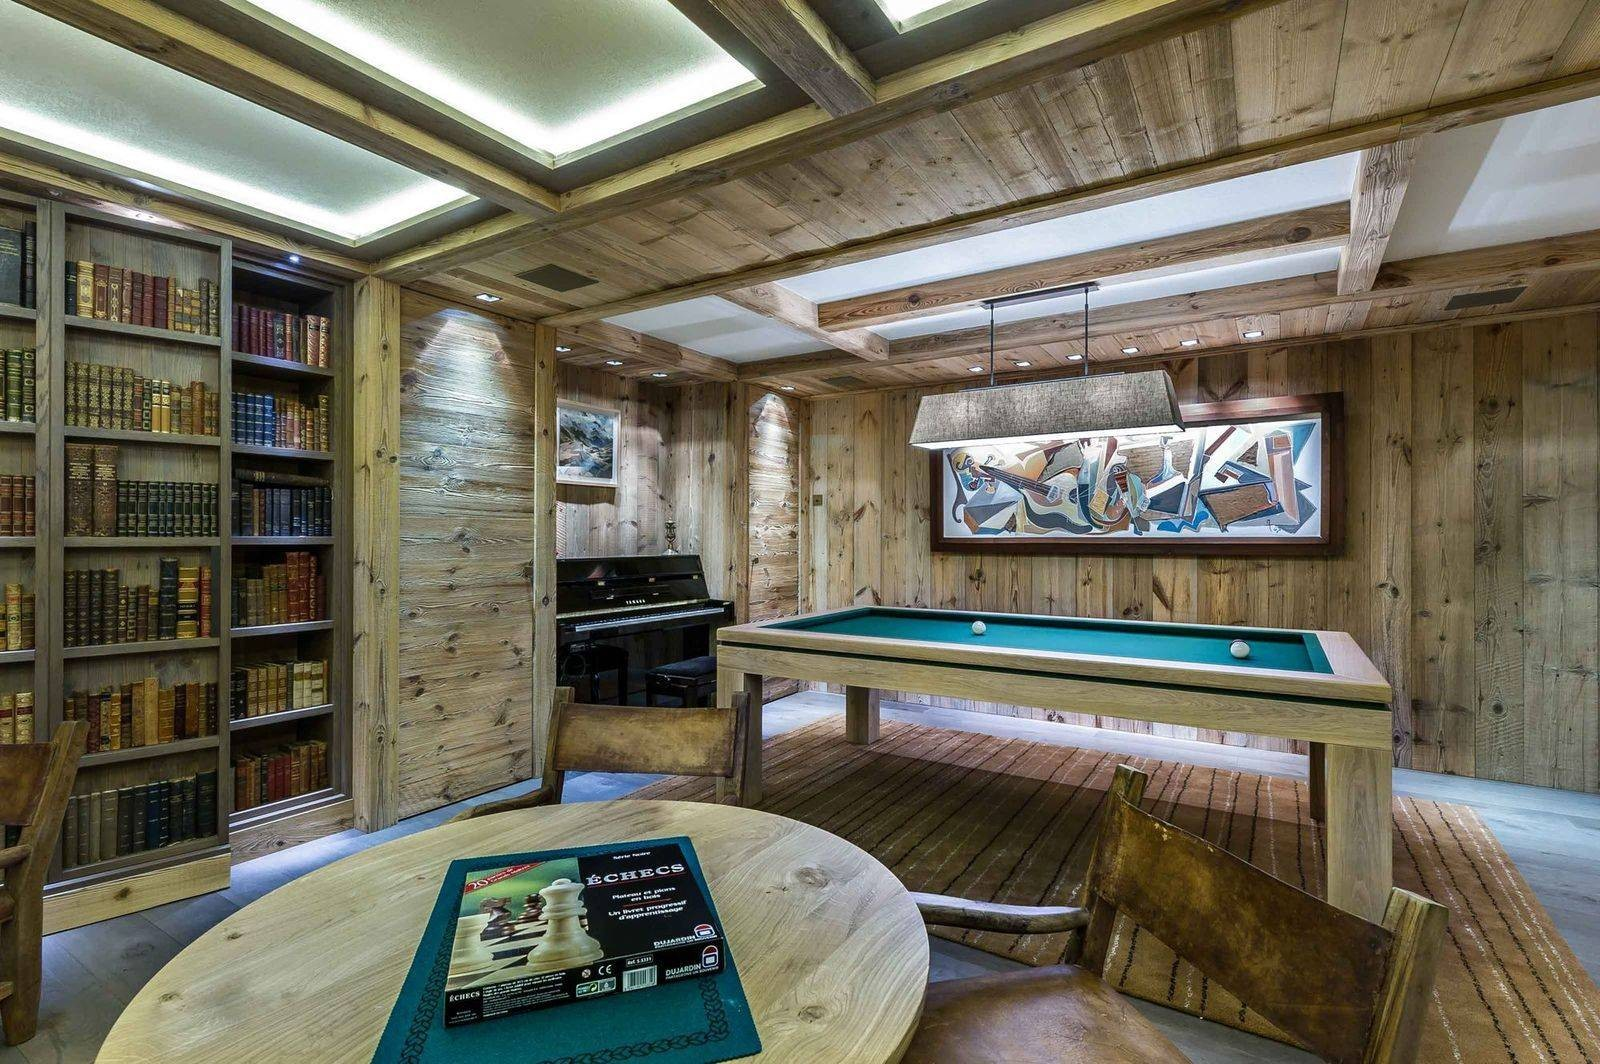 Courchevel 1850 Luxury Rental Chalet Chursinite Games Room